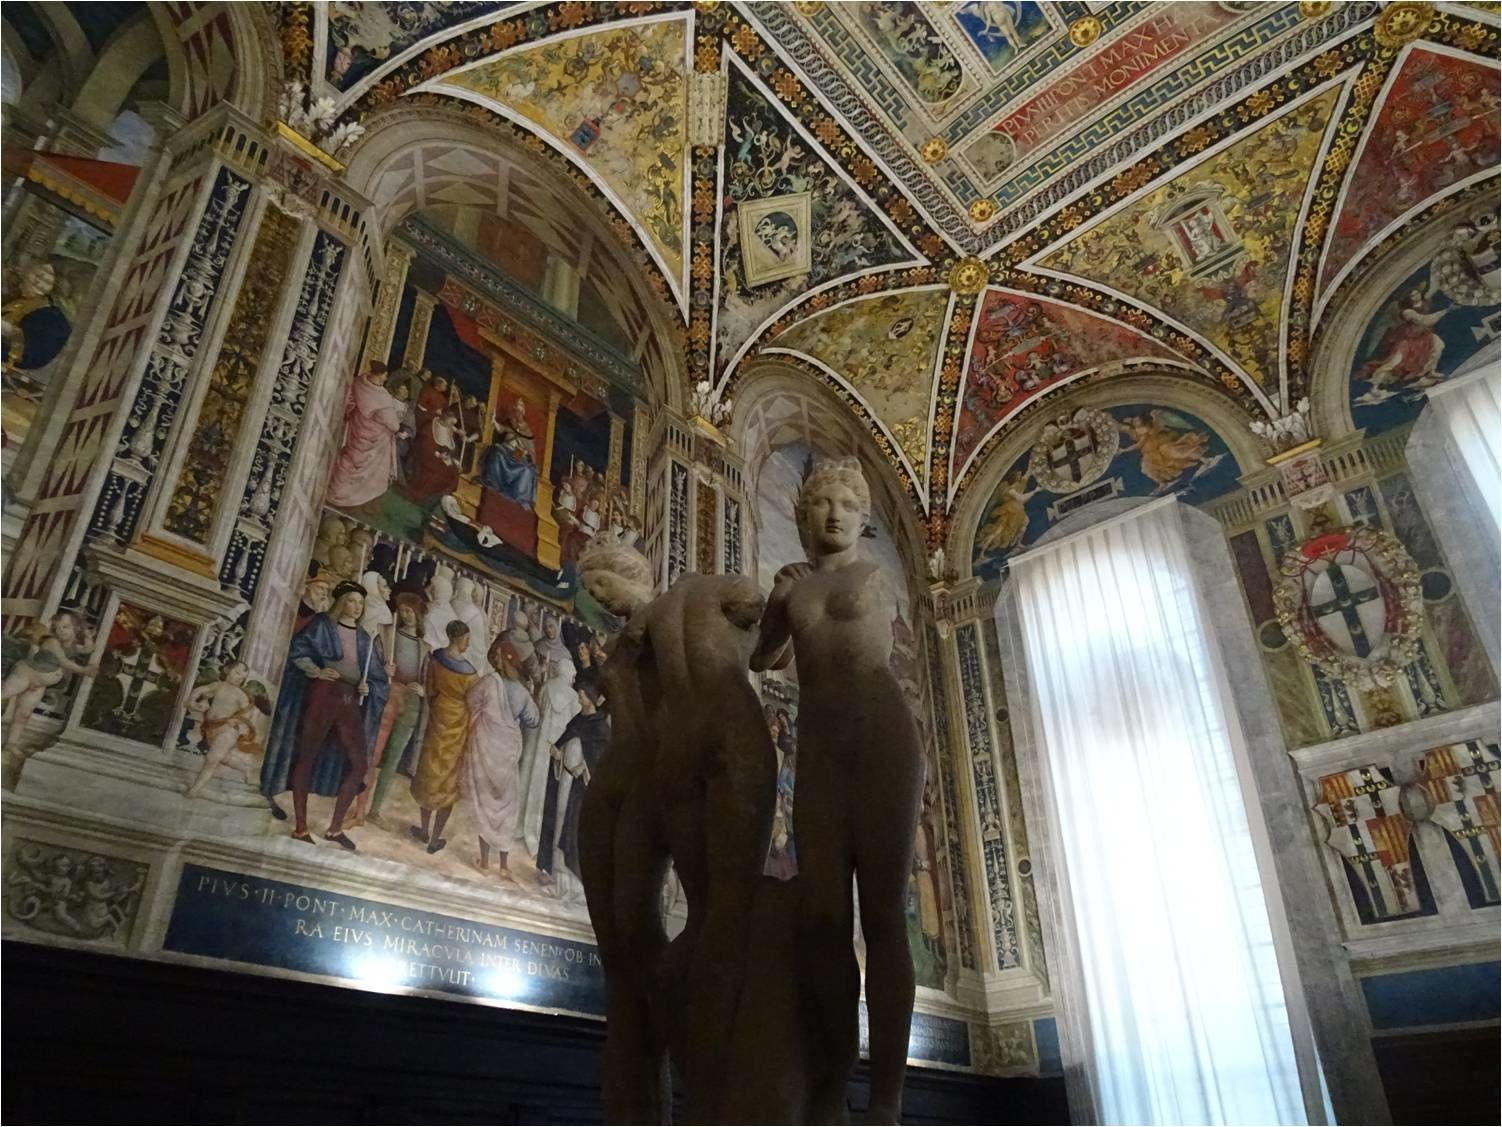 Sienne, Duomo, Libreria Piccolomini : Les trois Grâces